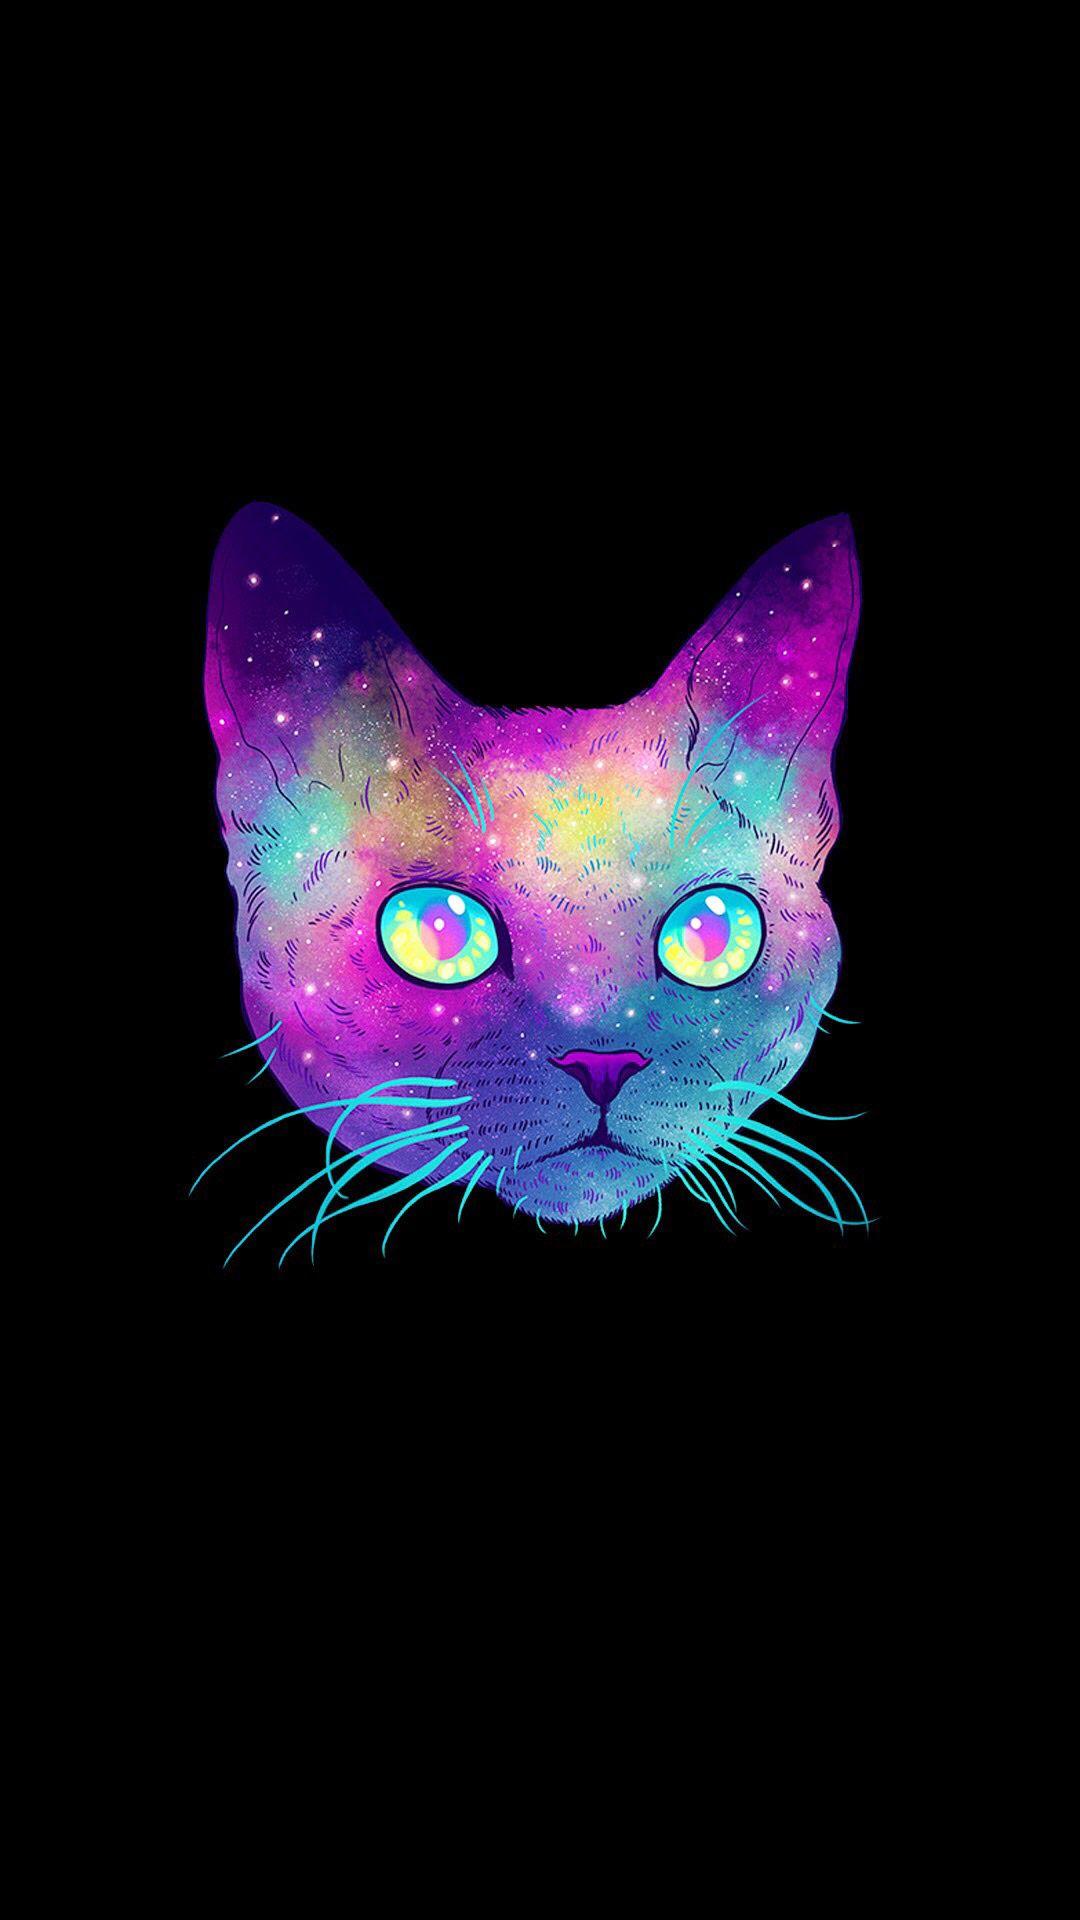 Phonewallpaper Cat Wallpaper Space Cat Wallpaper Backgrounds